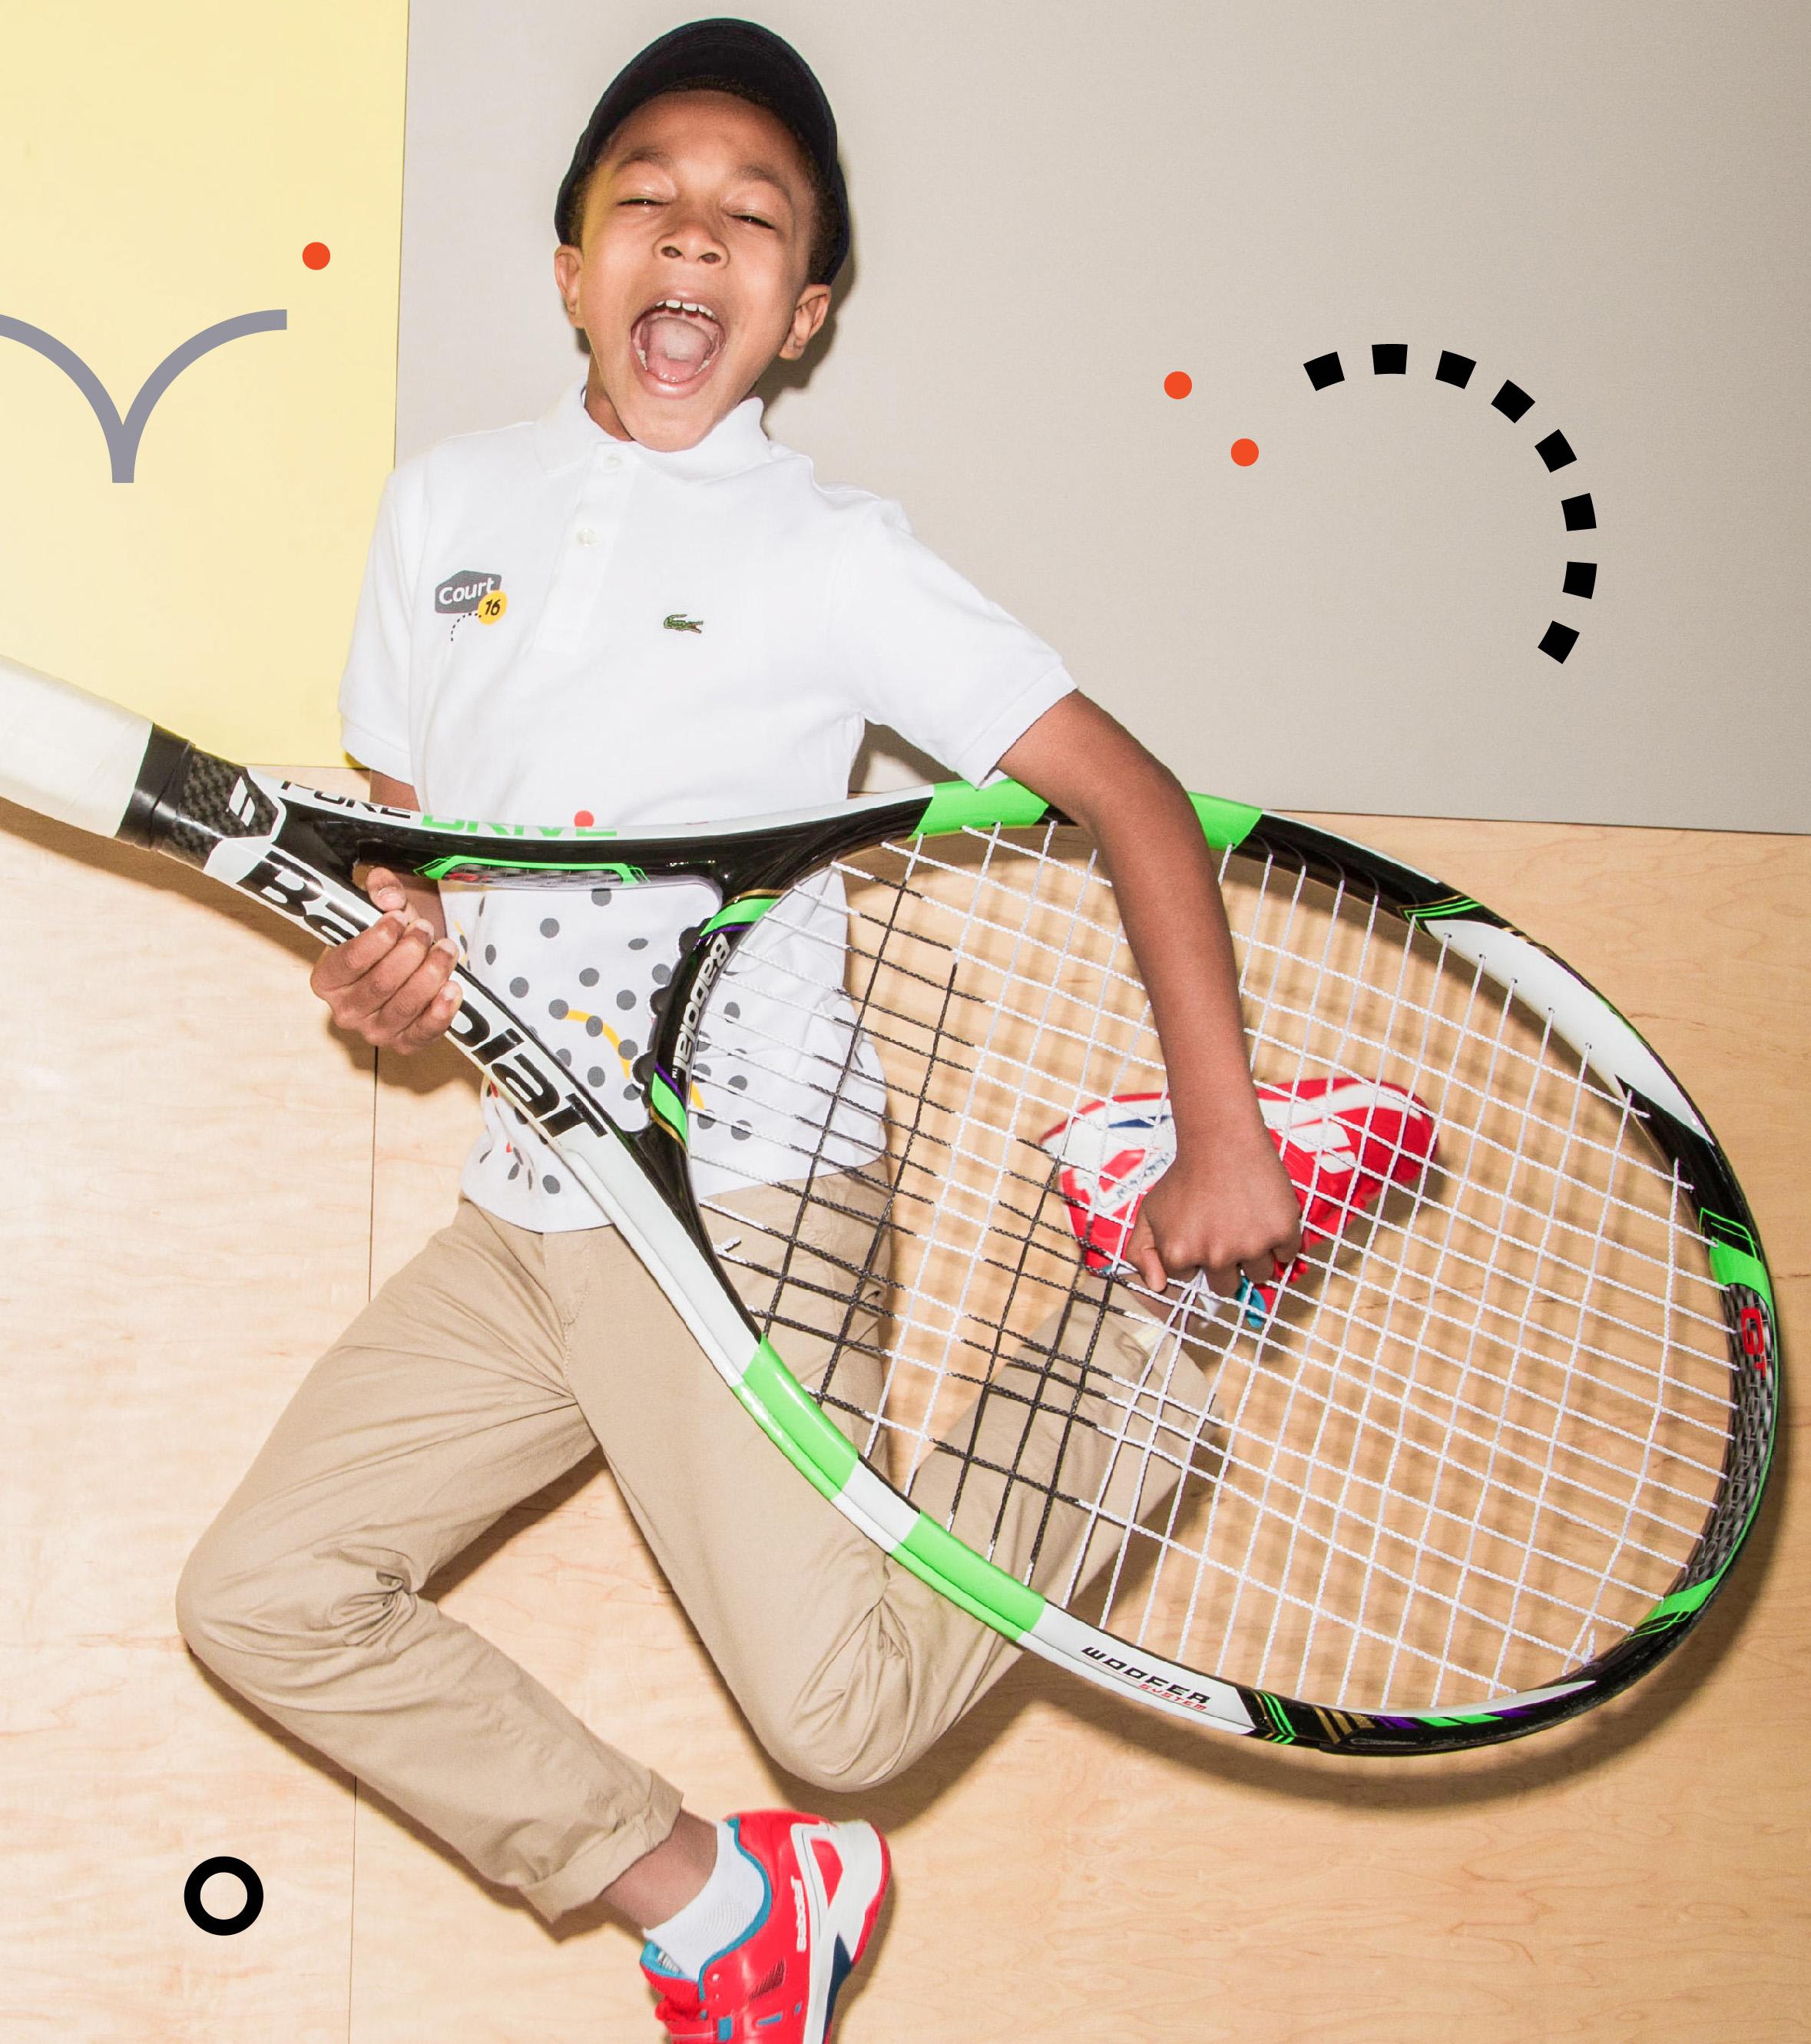 Boy using giant racket to preform guitar solo